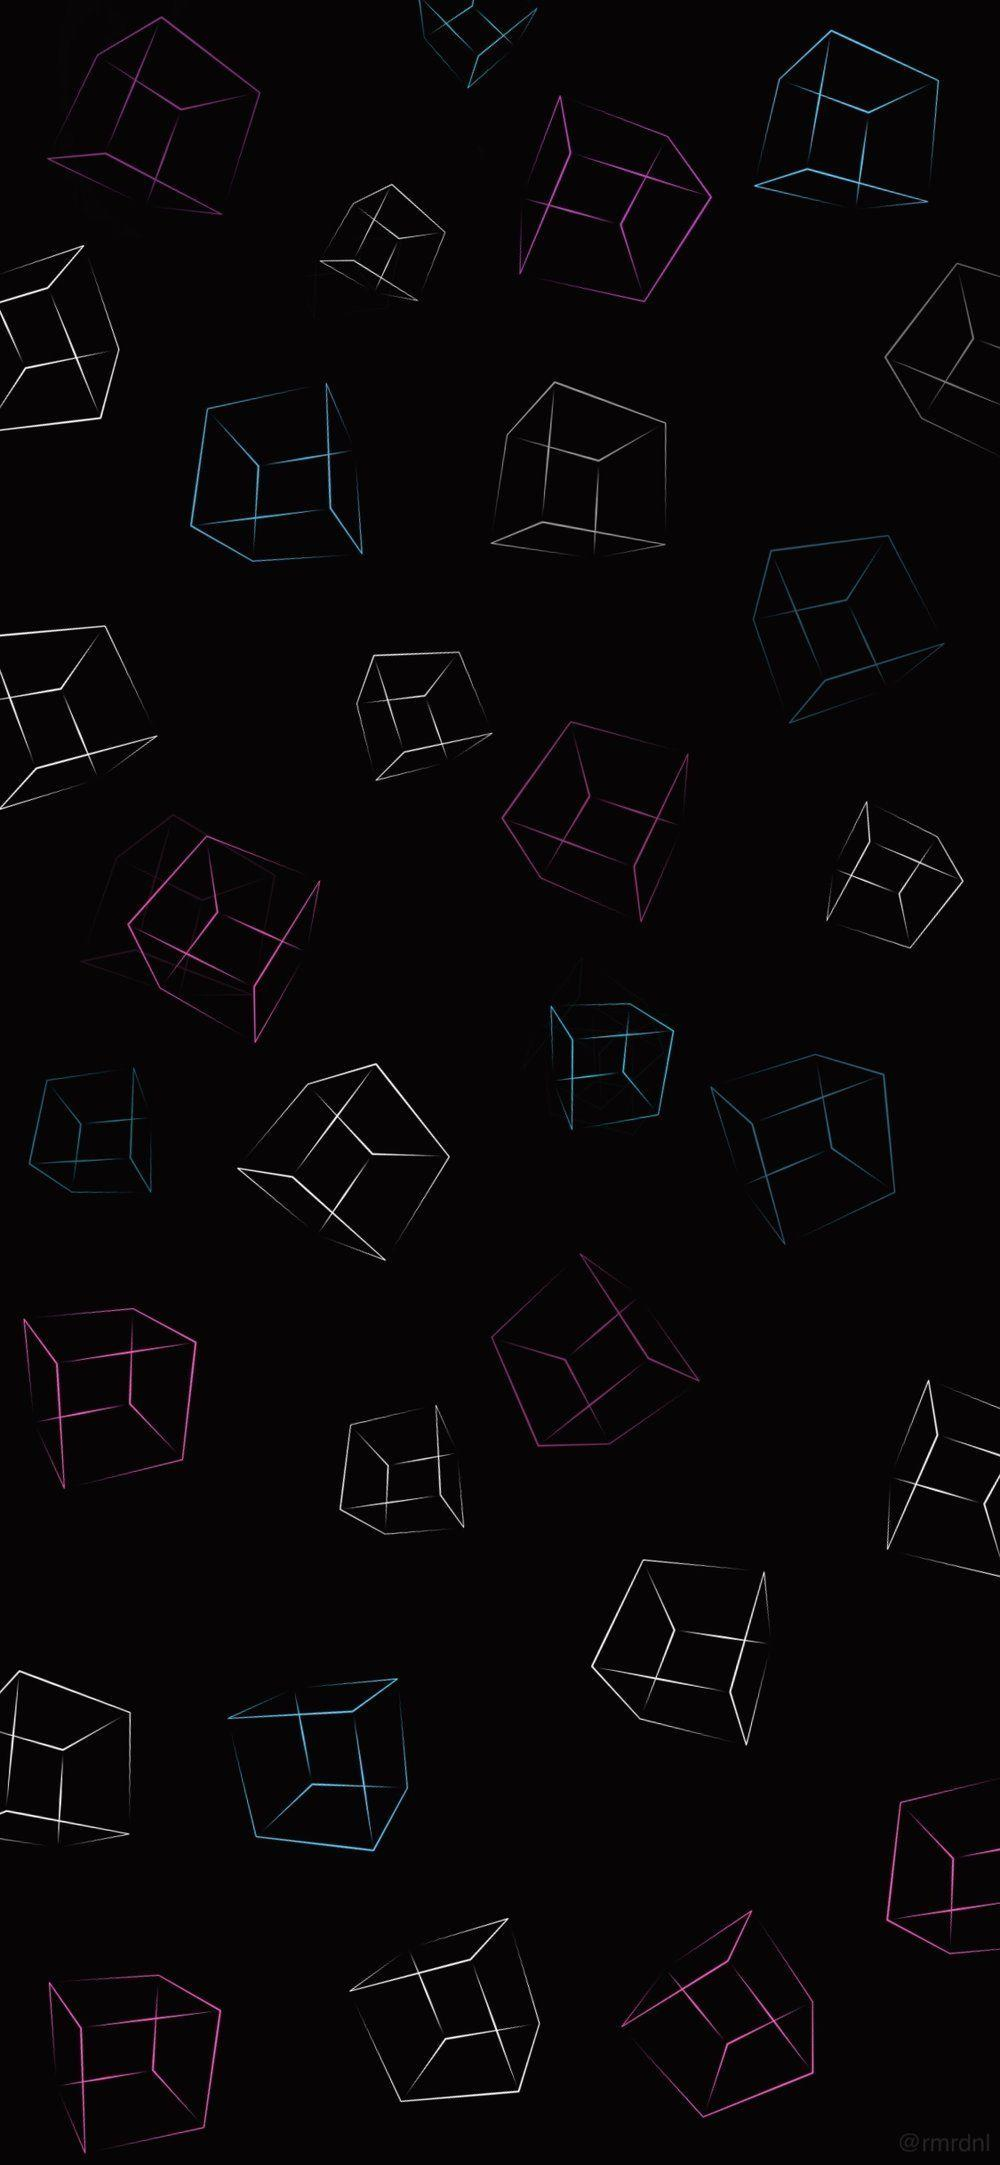 Iphone Xr Black Wallpapers Wallpaper Cave